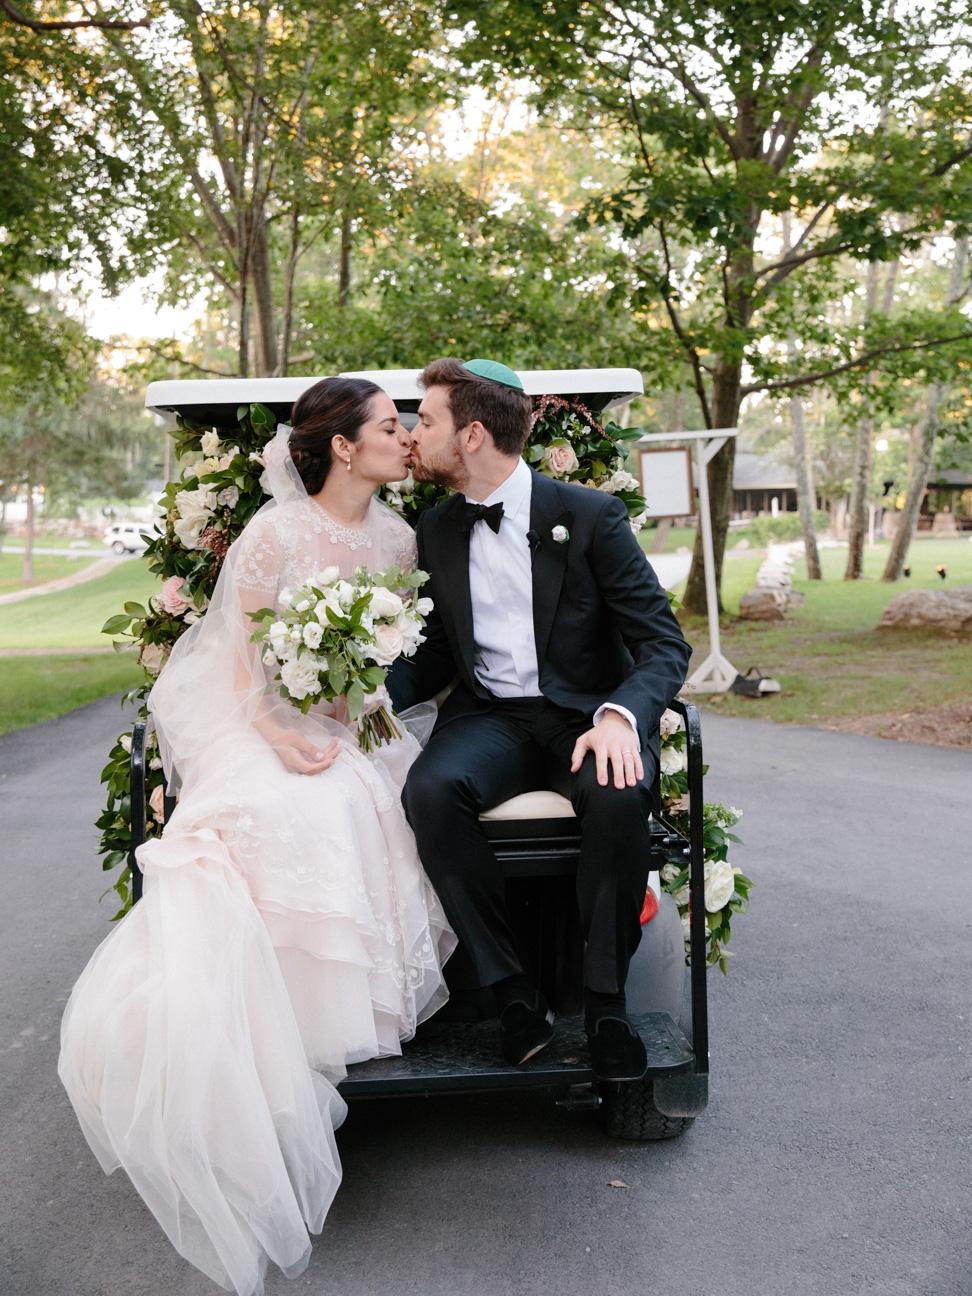 KarenHillPhotography-Parizat-Wedding-0652.jpg